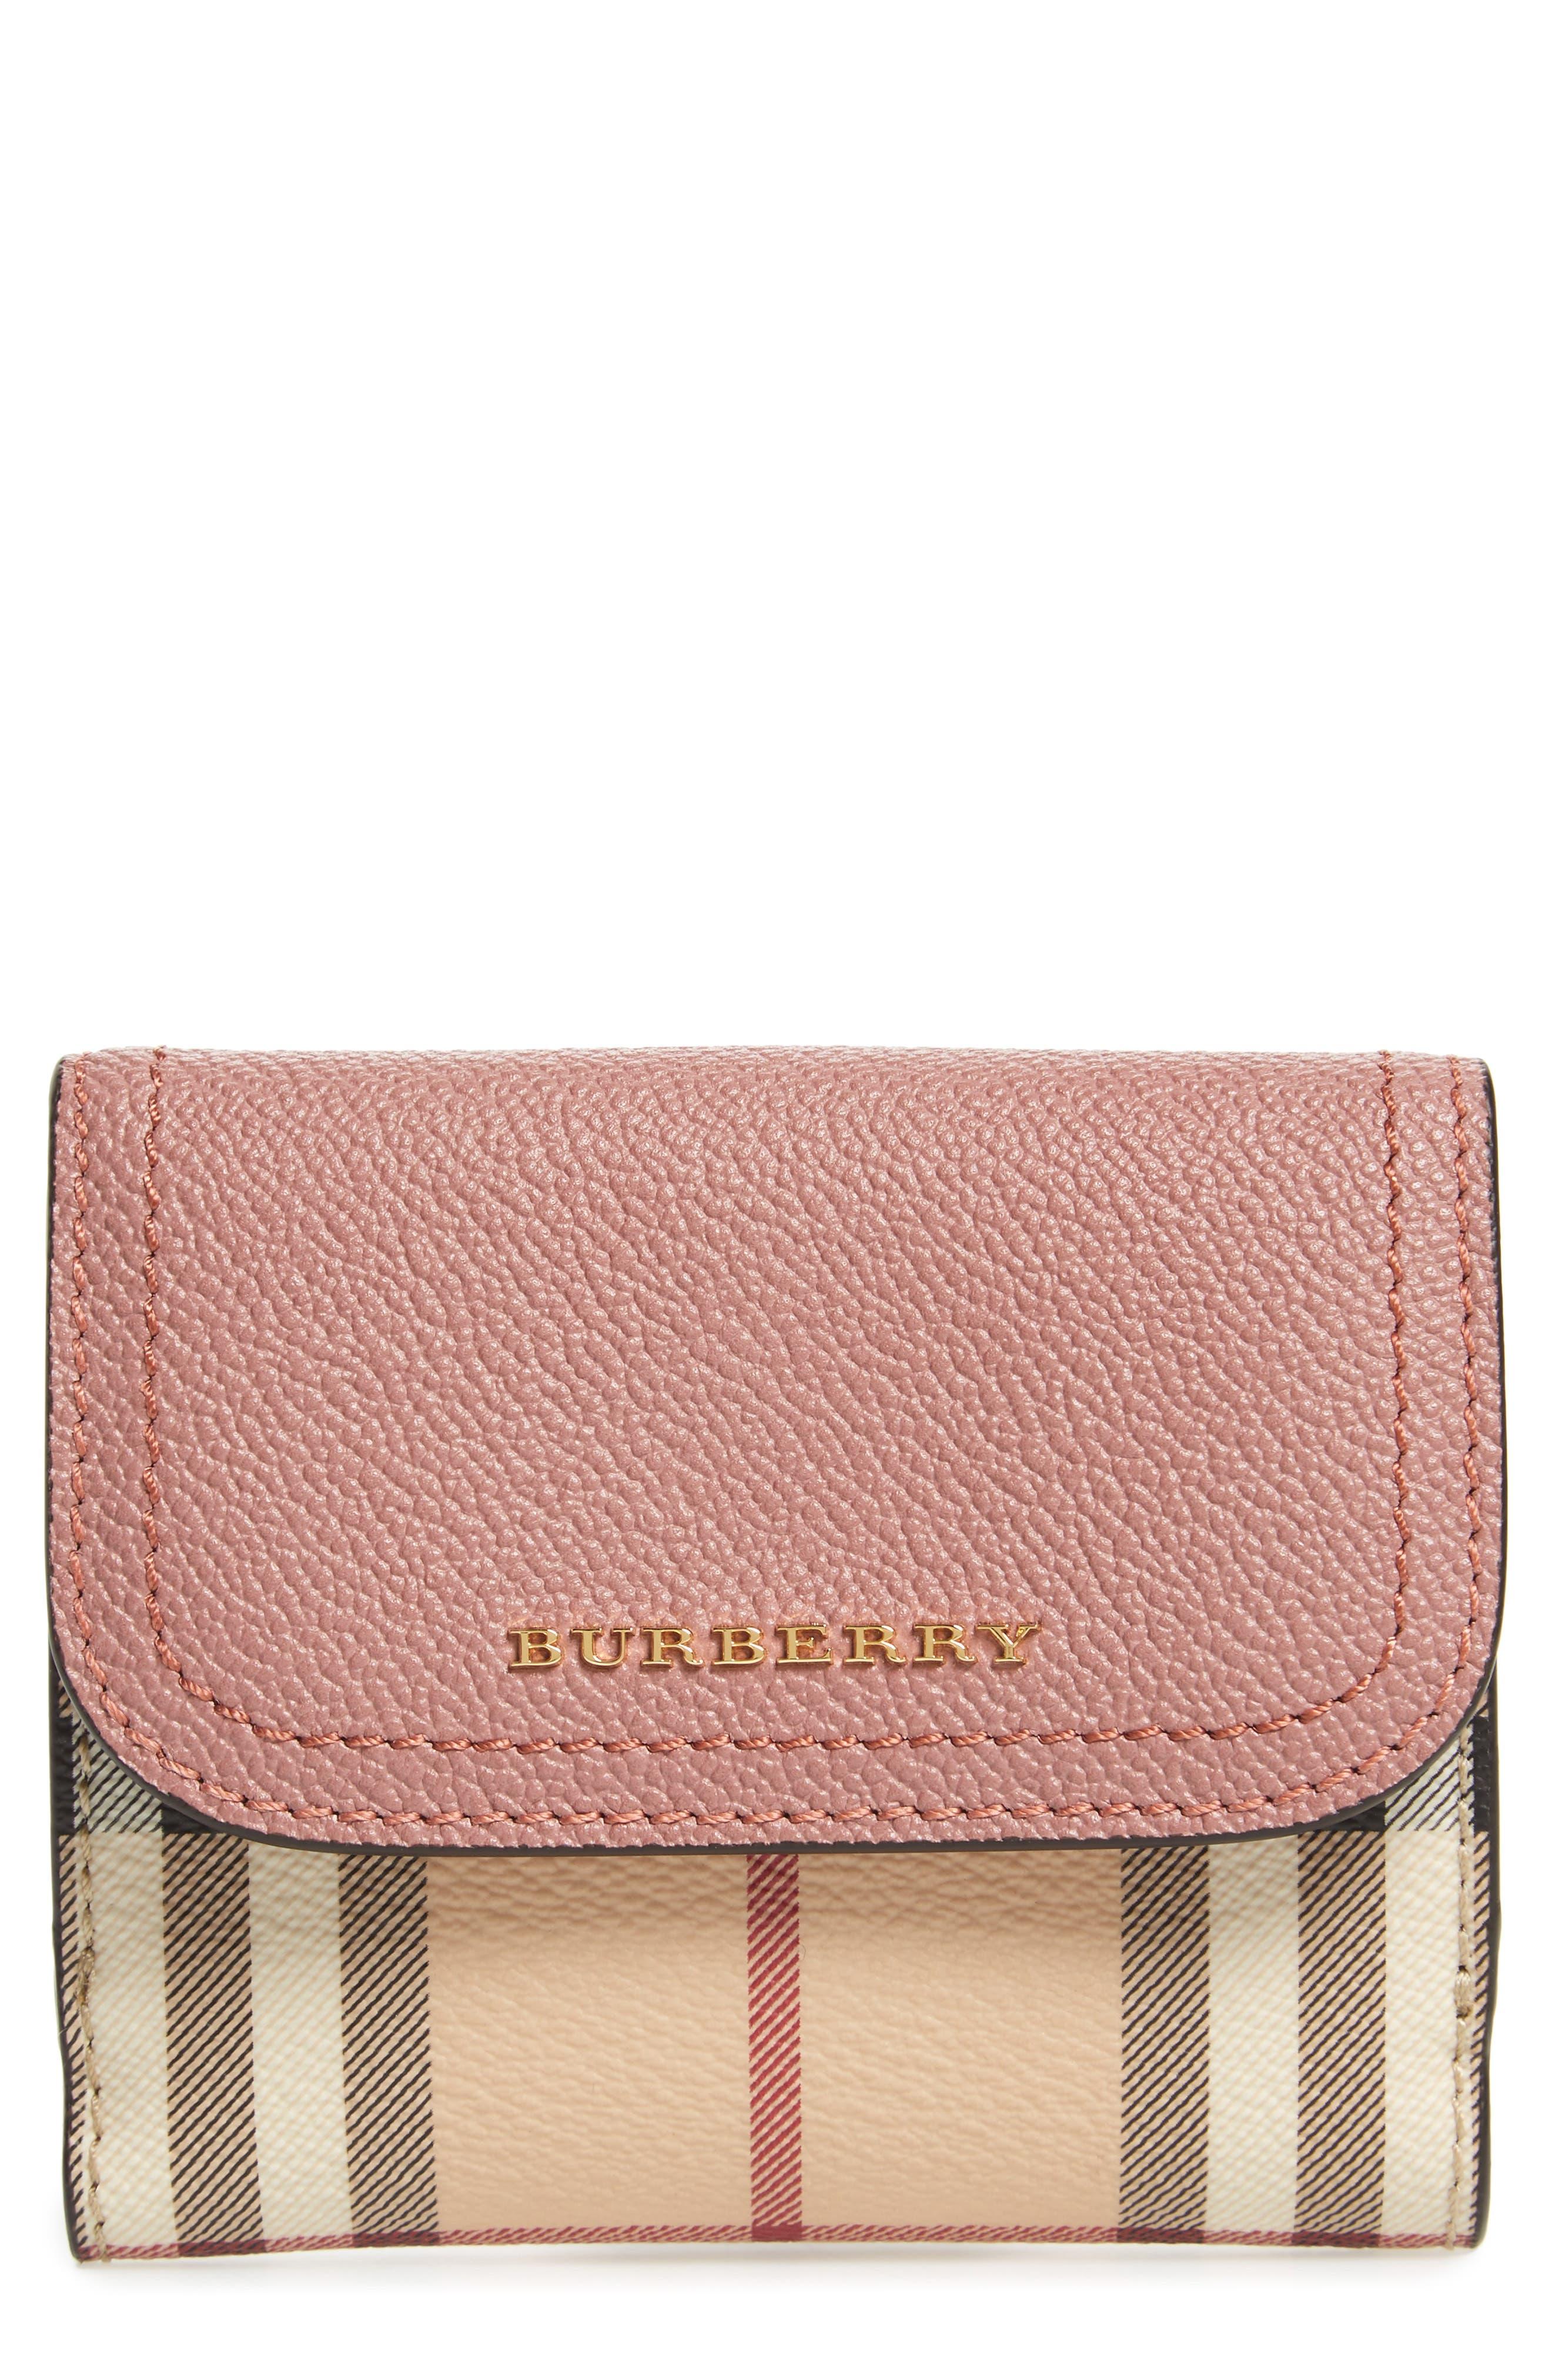 Luna French Haymarket Check Wallet,                         Main,                         color, Dusty Pink/ Multi